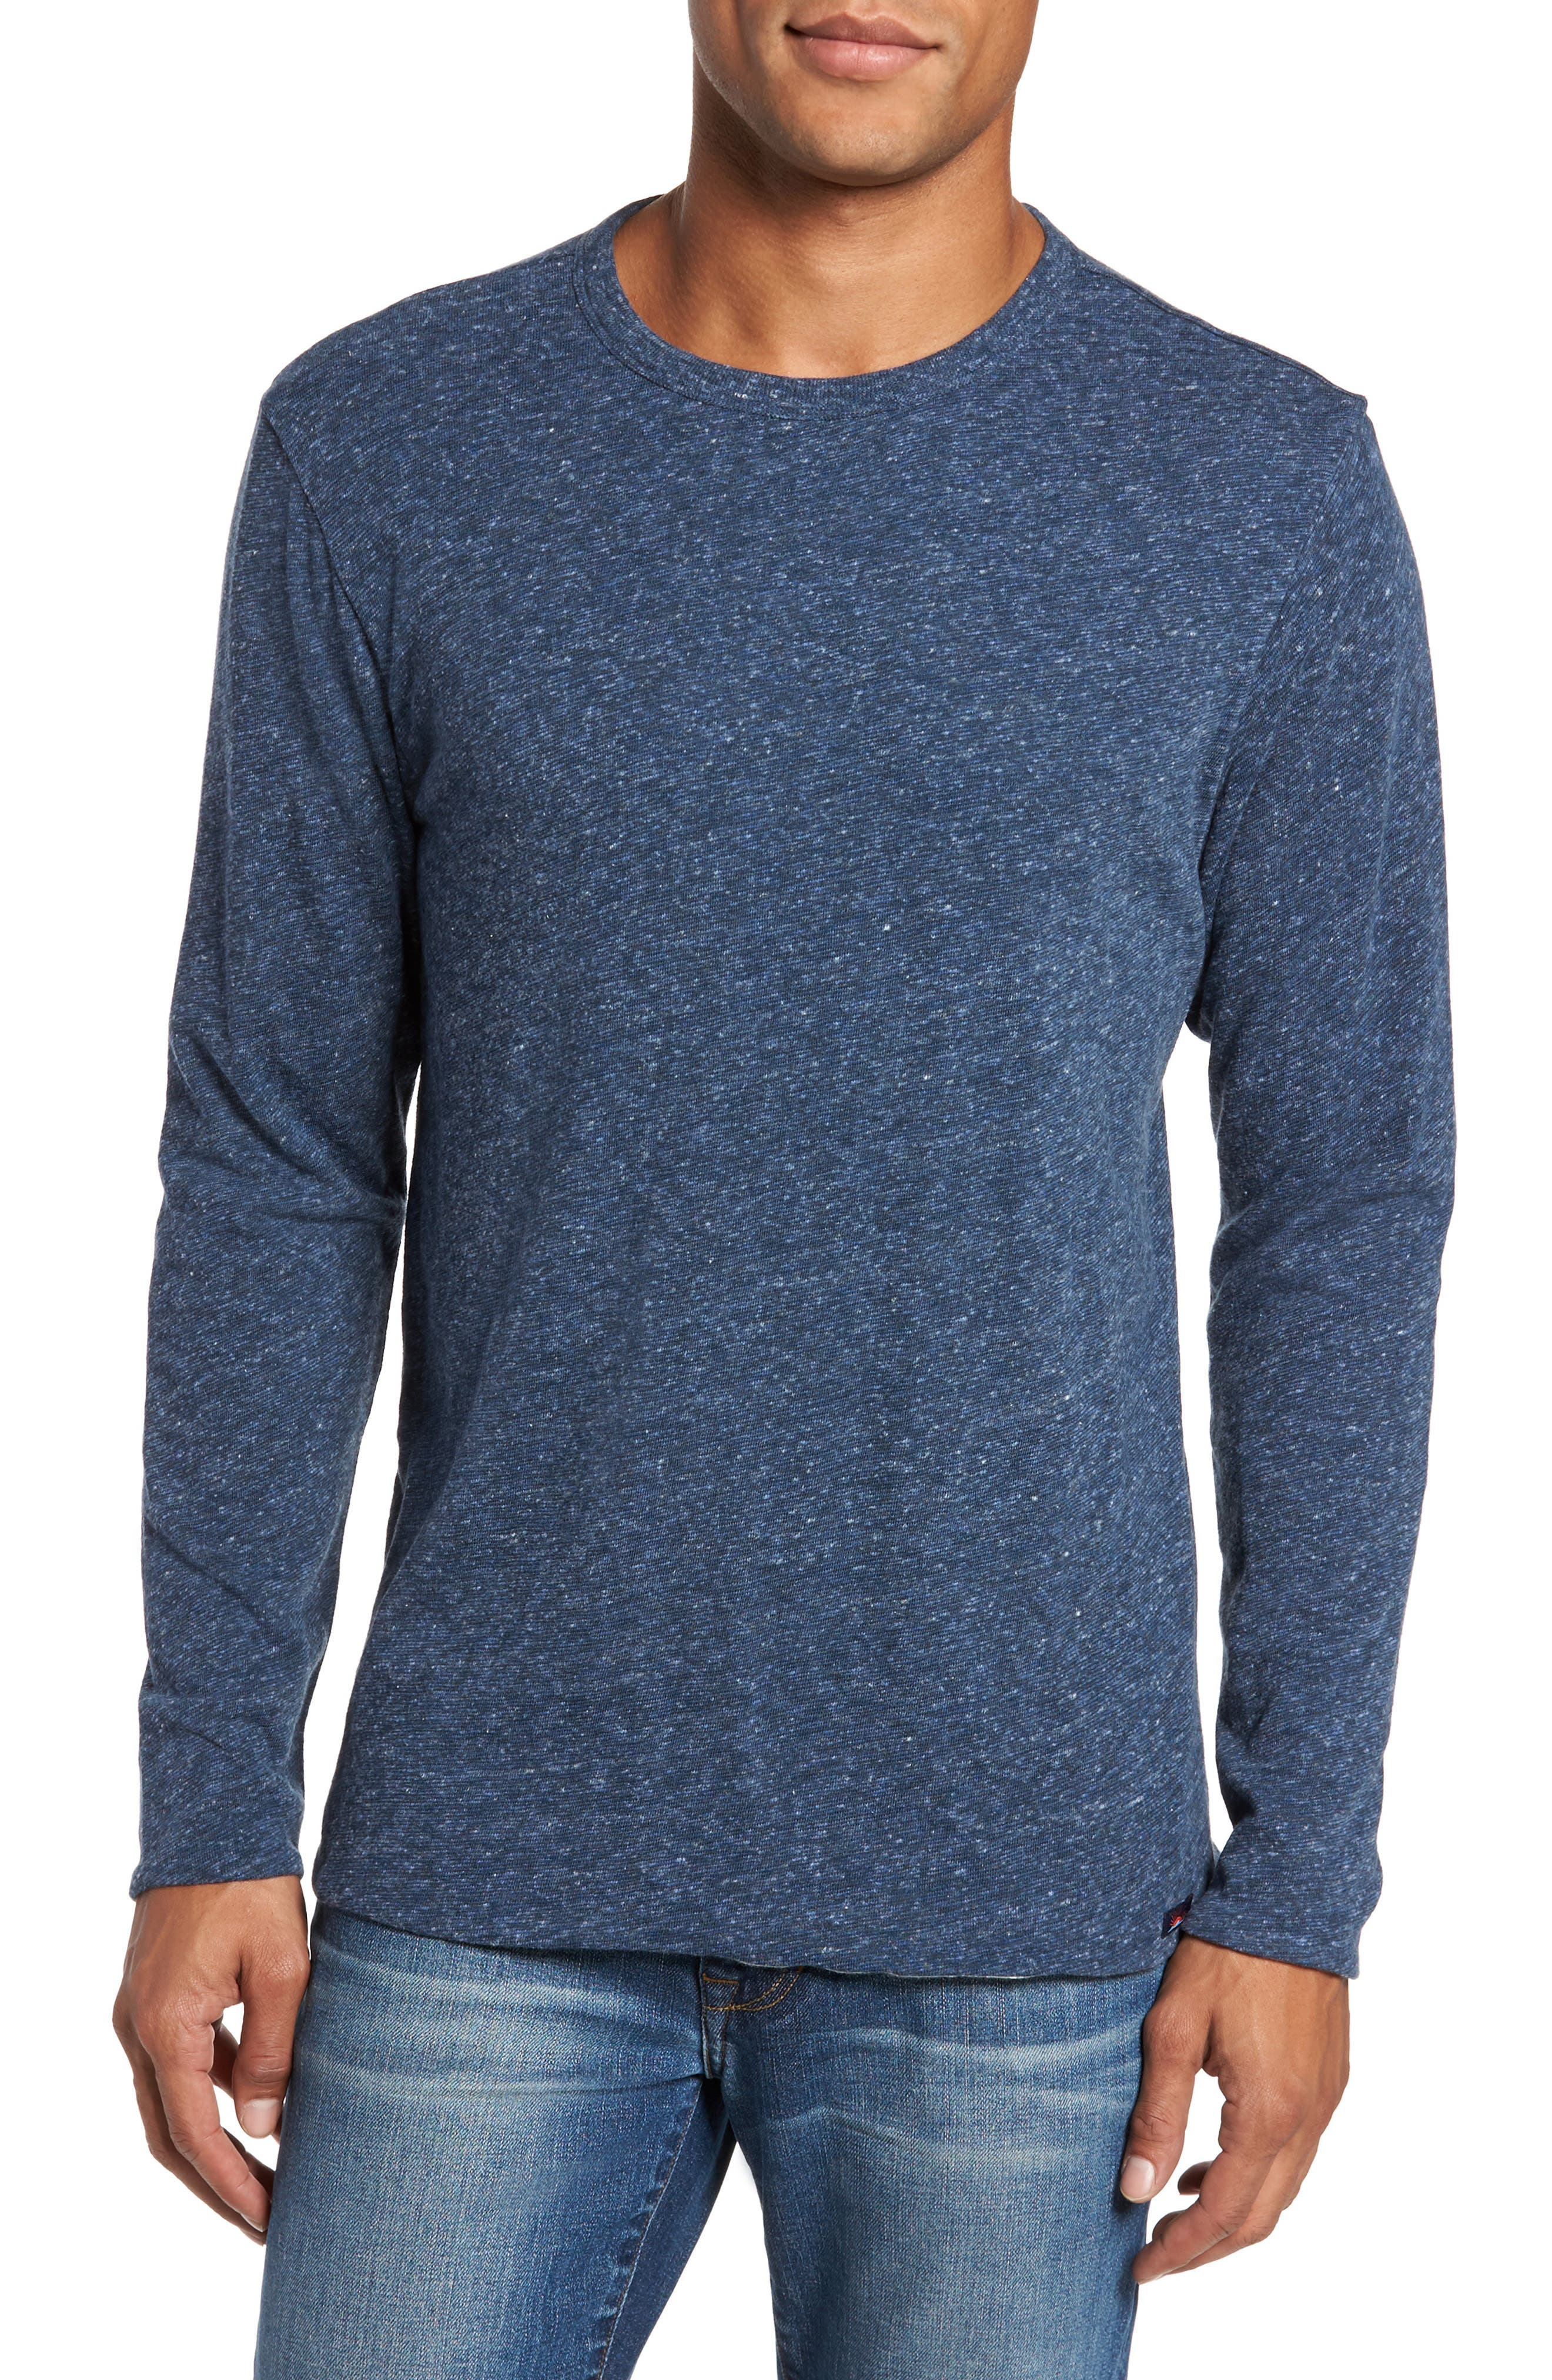 Main Image - Faherty Heathered Reversible Long Sleeve Crewneck T-Shirt